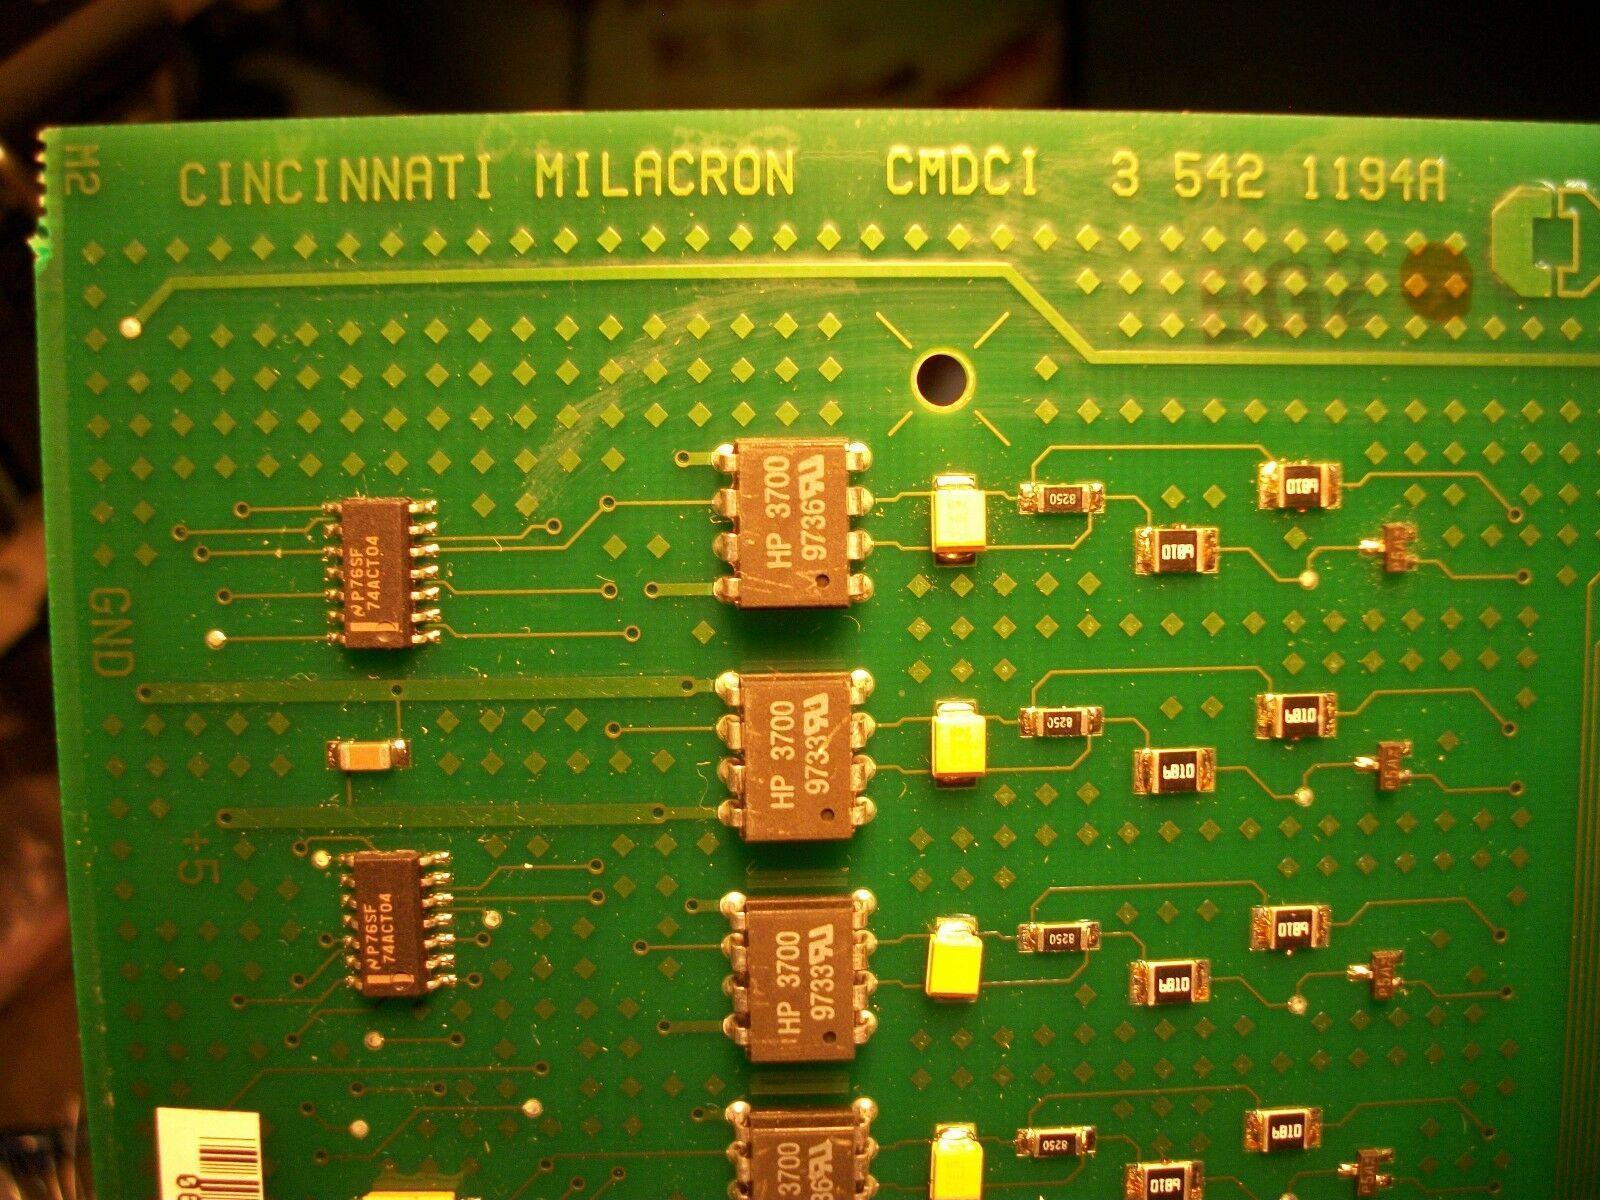 Cincinnati Milacron Siemens CNC Control Circuit Board CMDCI 3-542-1194A